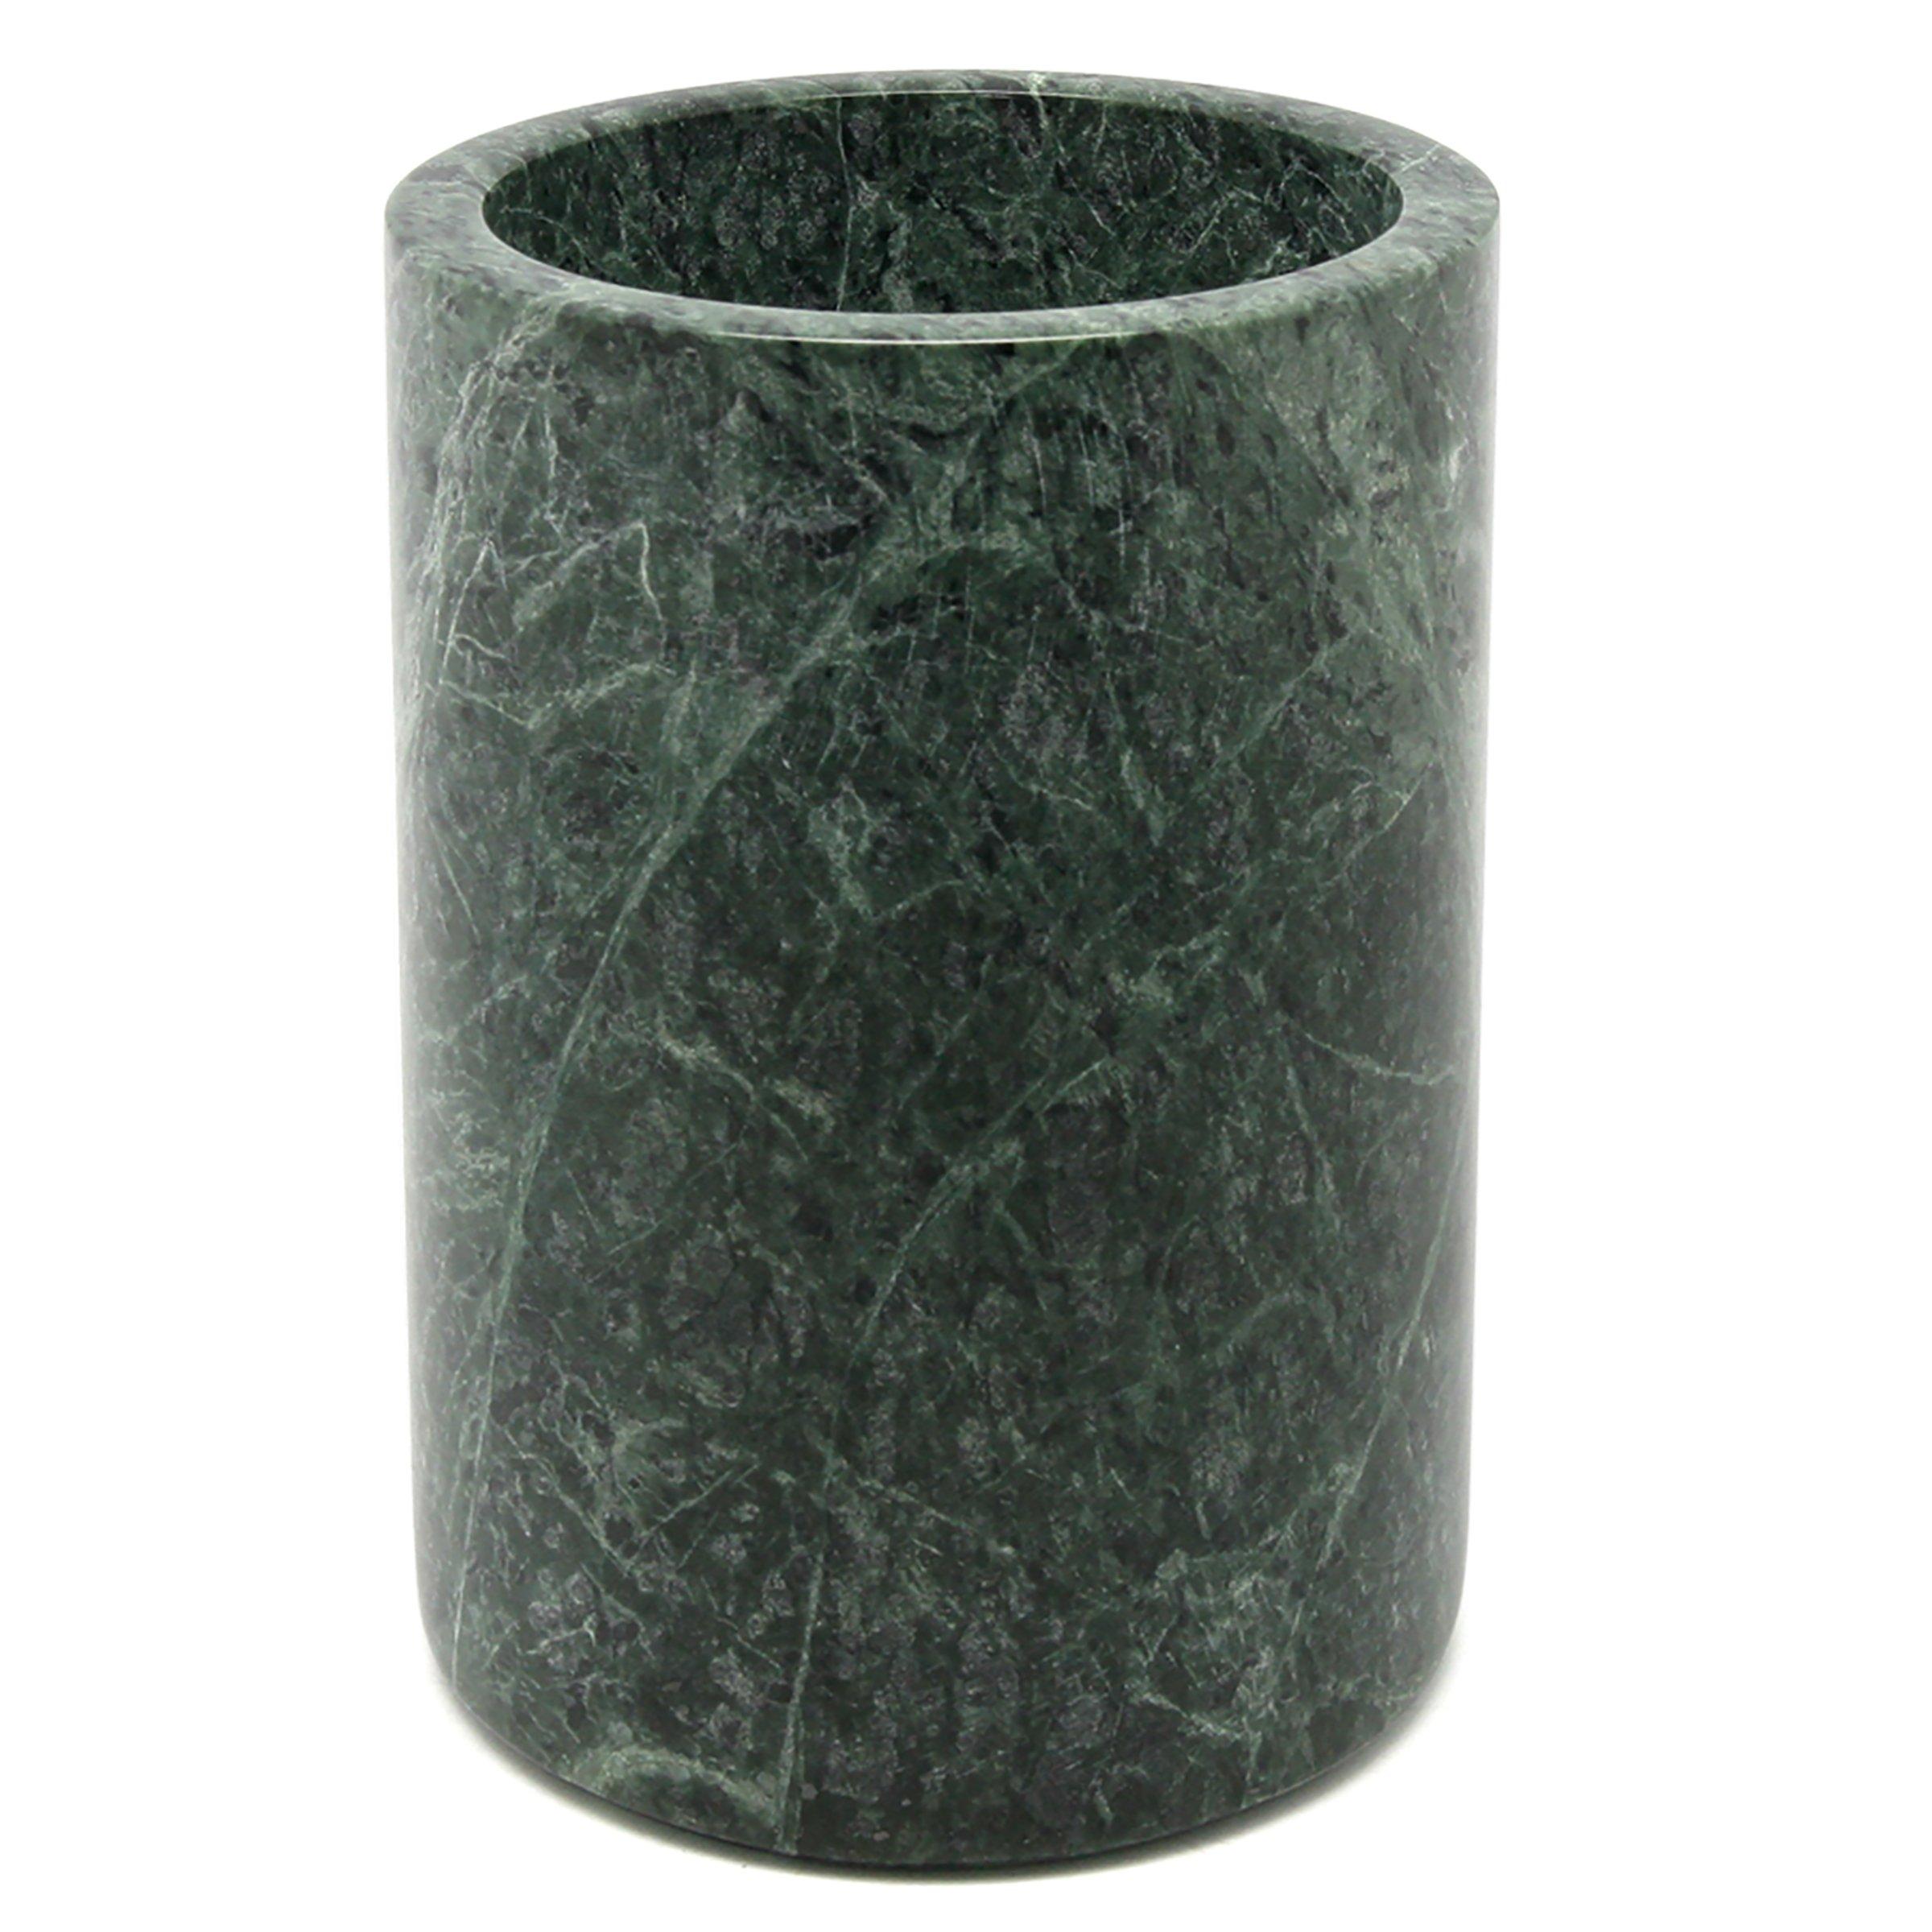 Creative Home 74047 Natural Green Marble Stone Tool Crock, Utensil Holder, 5'' Diam. x 7'' H,